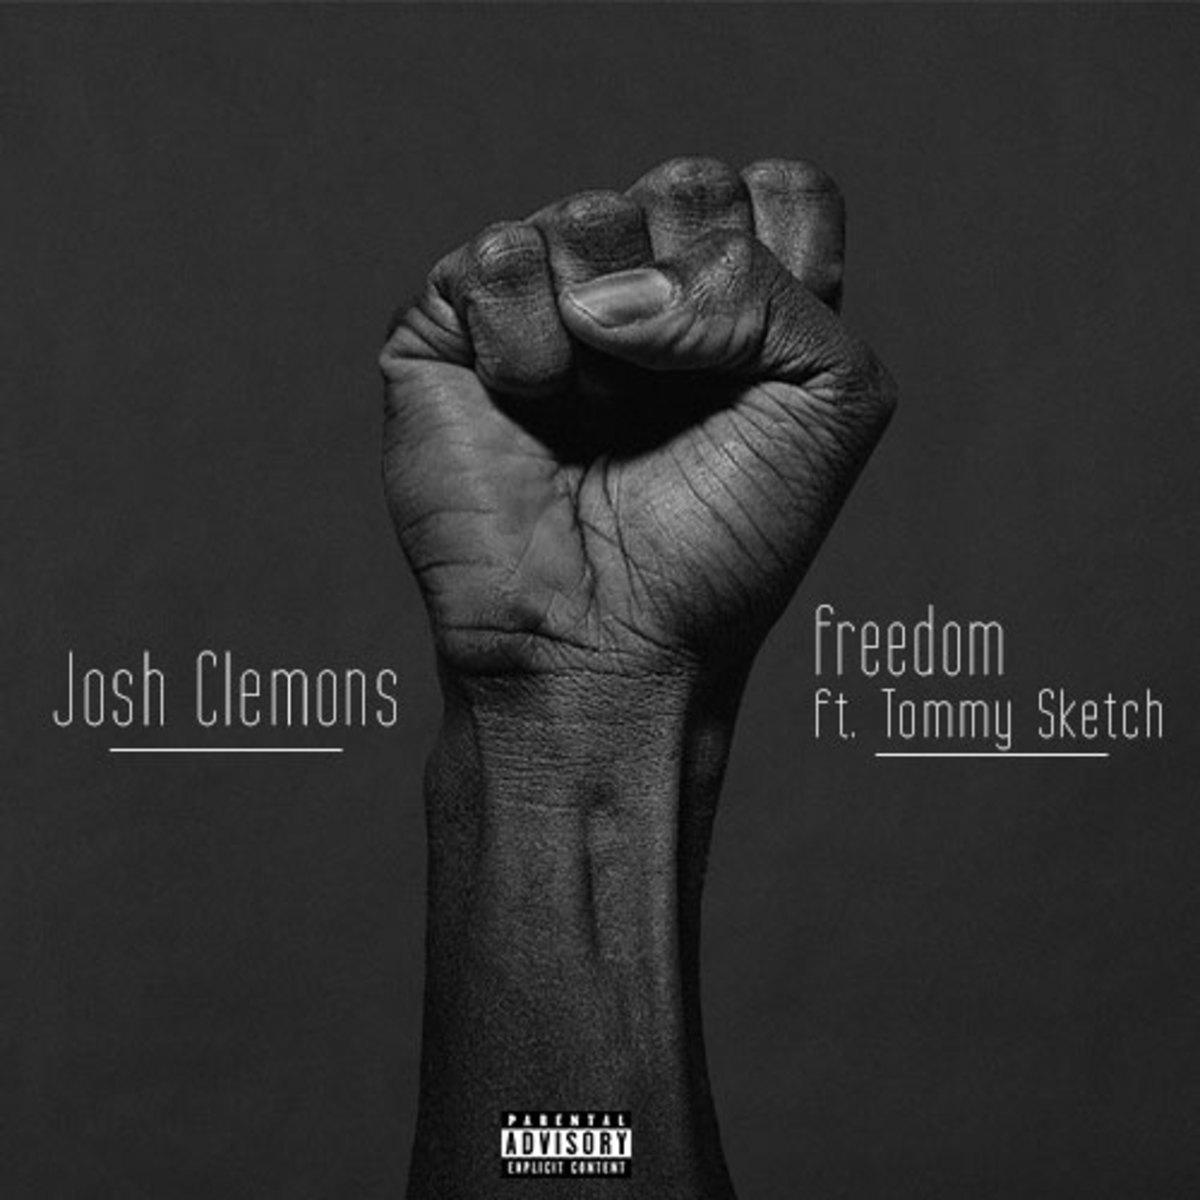 josh-clemons-freedom.jpg